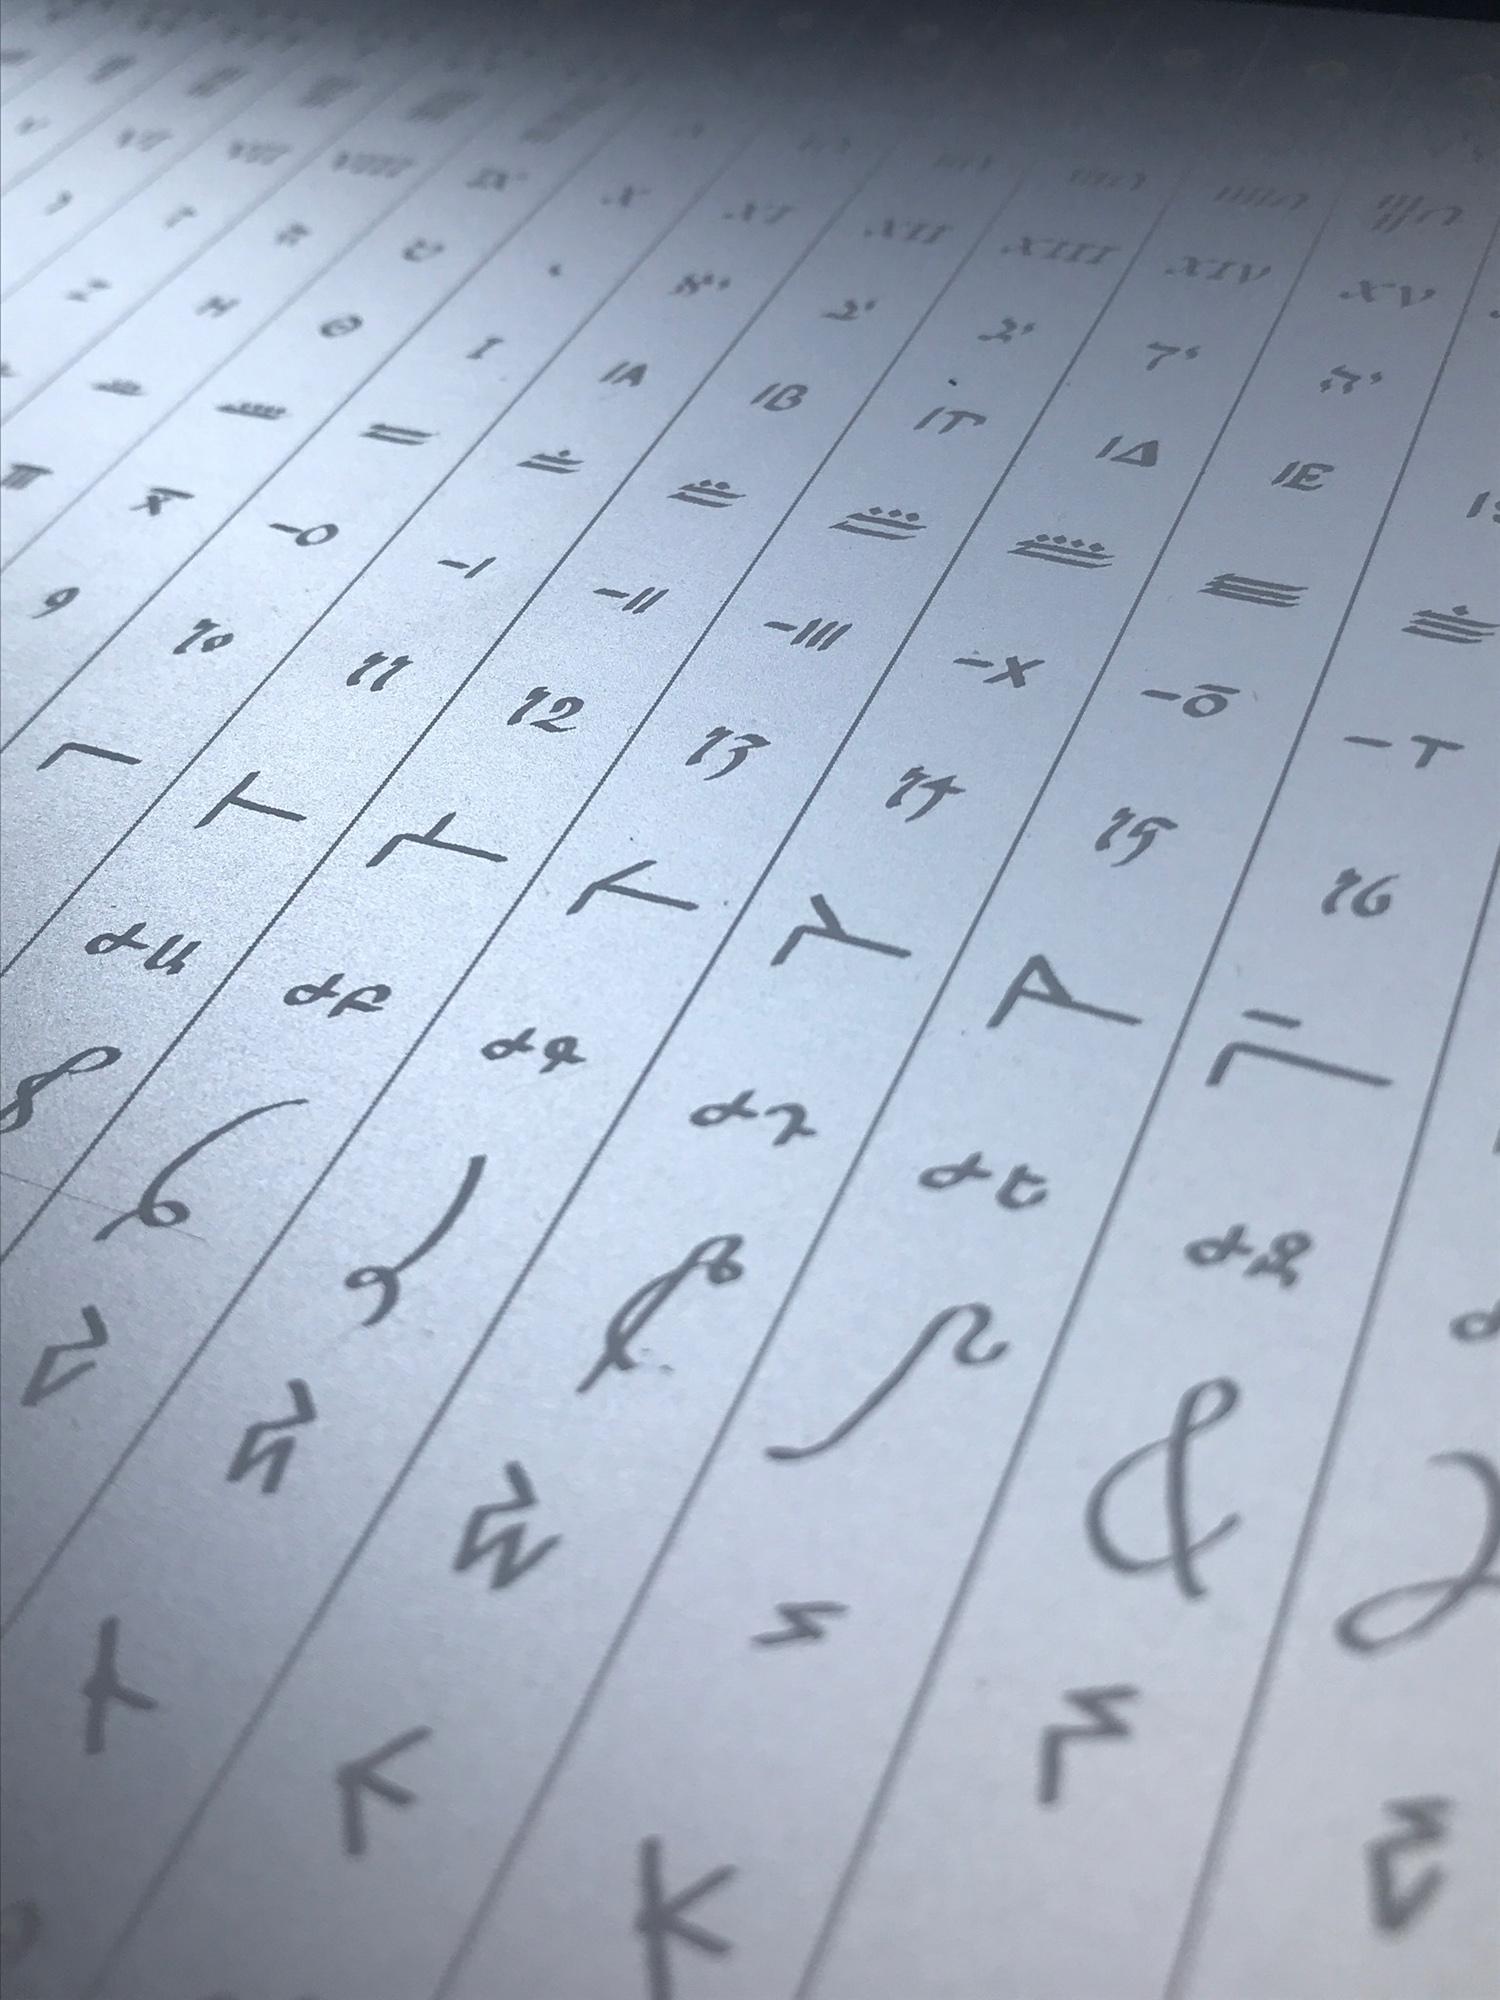 Lenny Moore - Numerical Rosetta Stone